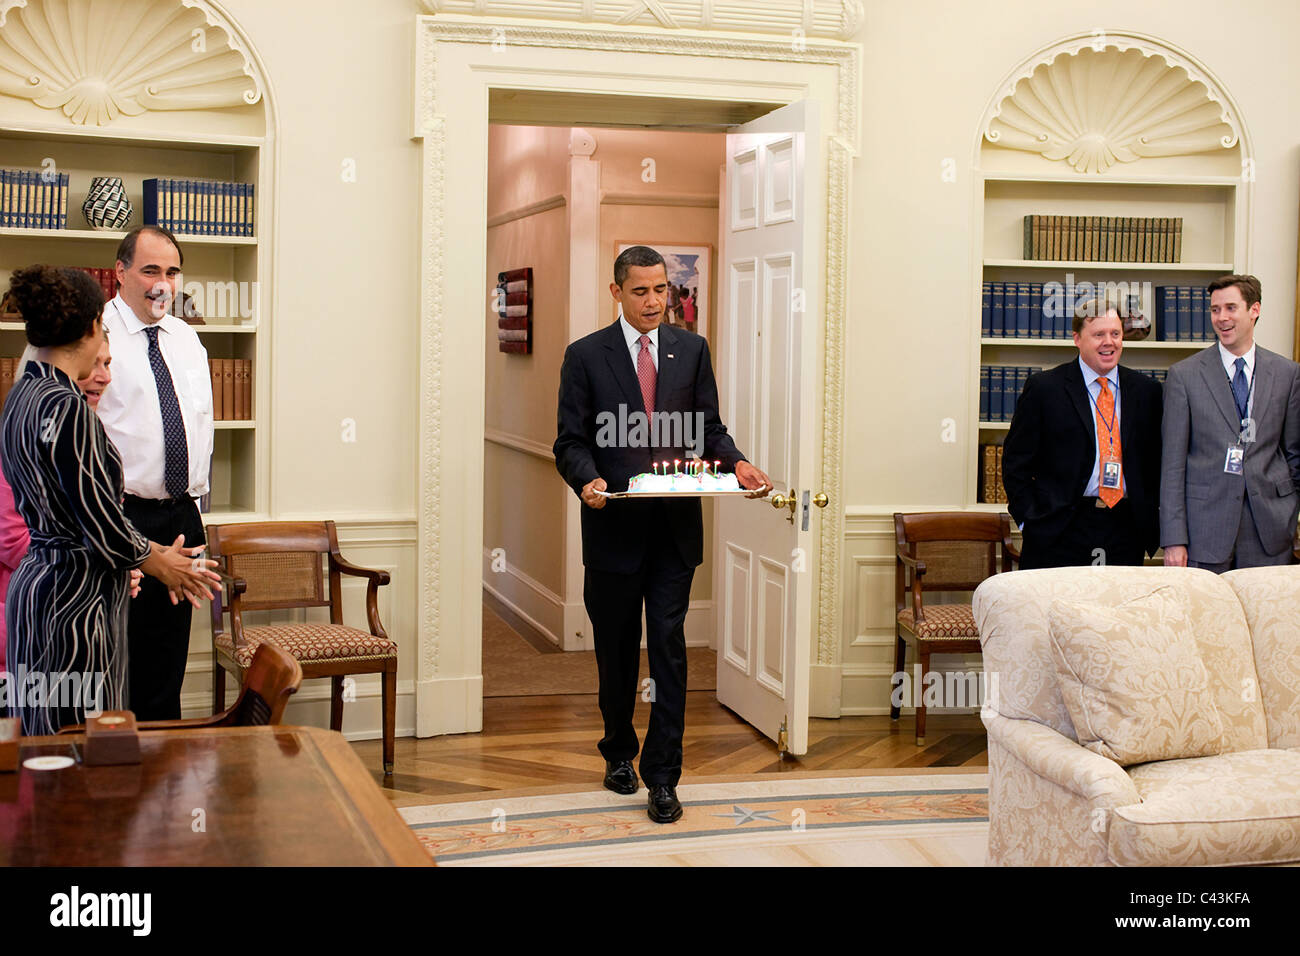 Awesome President Obama Cake Birthday Stock Photos President Obama Cake Funny Birthday Cards Online Inifodamsfinfo